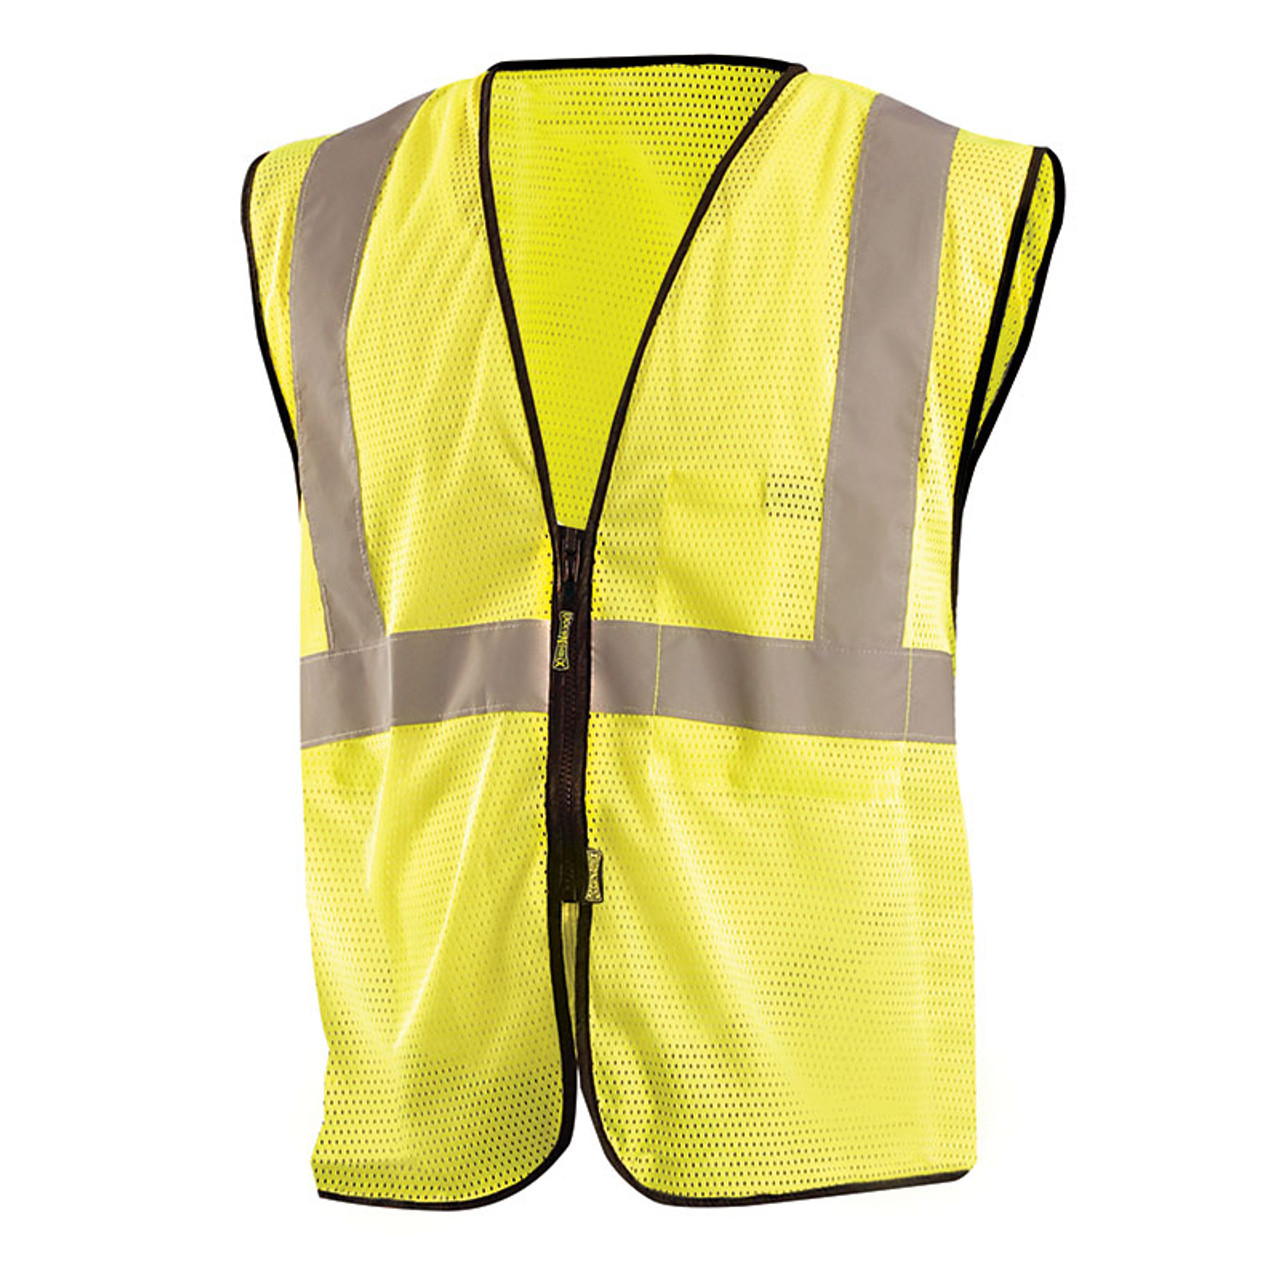 79445897ef9 Occunomix Class 2 Hi Vis Economy Mesh Zipper Front Vest ECO-GCZ Yellow Front